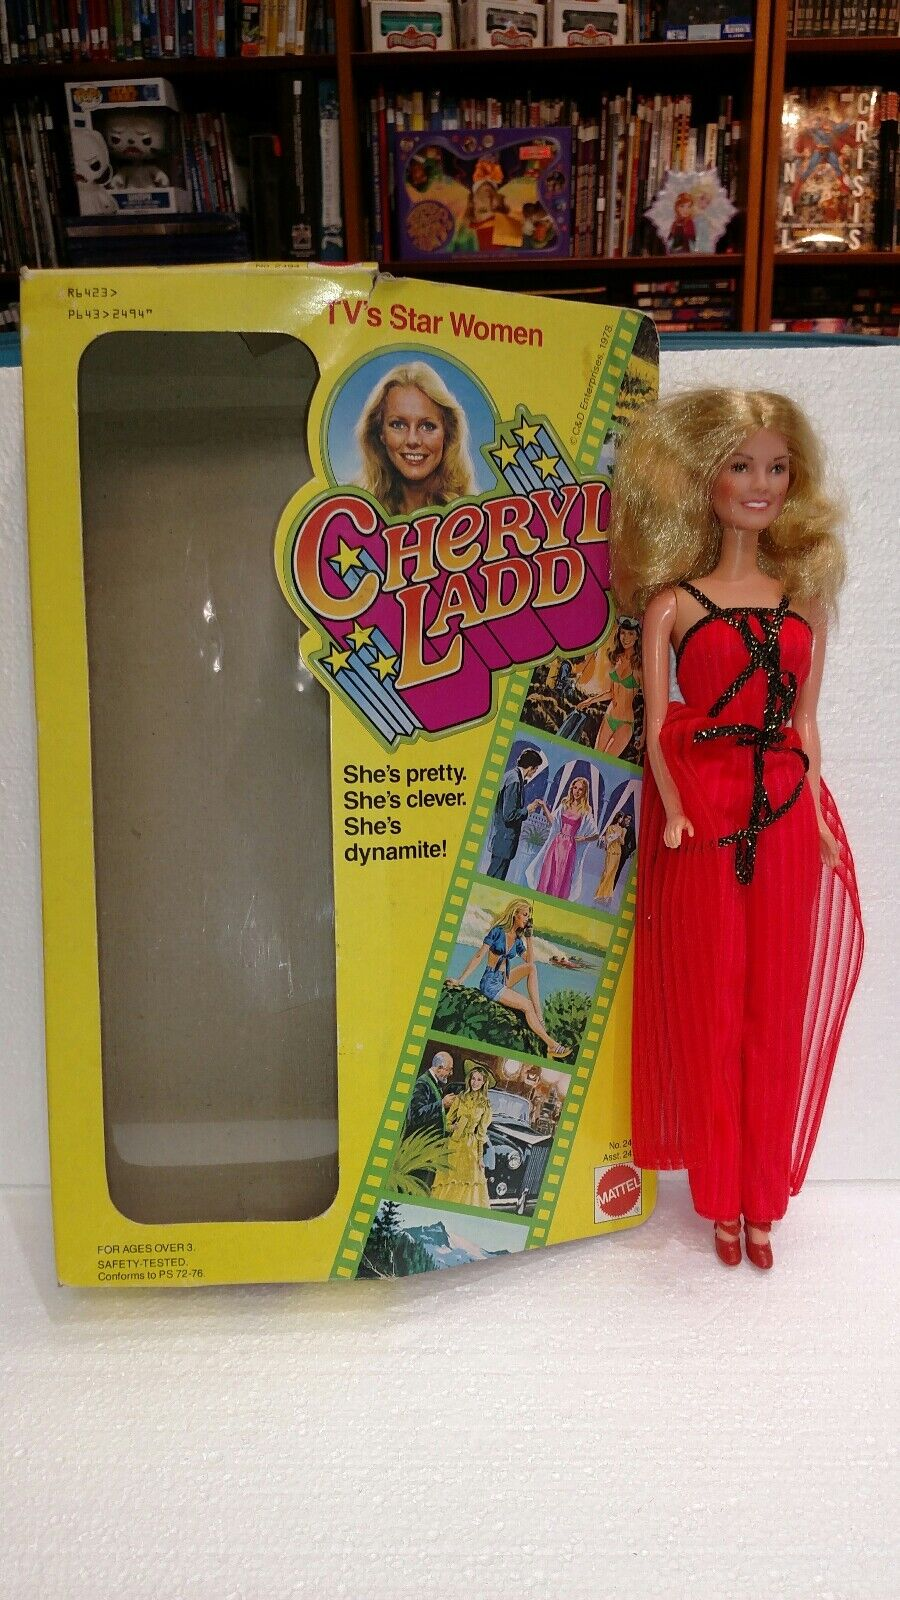 1978 MATTEL CHERYL LADD TV'S STAR damen DOLL IN BOX